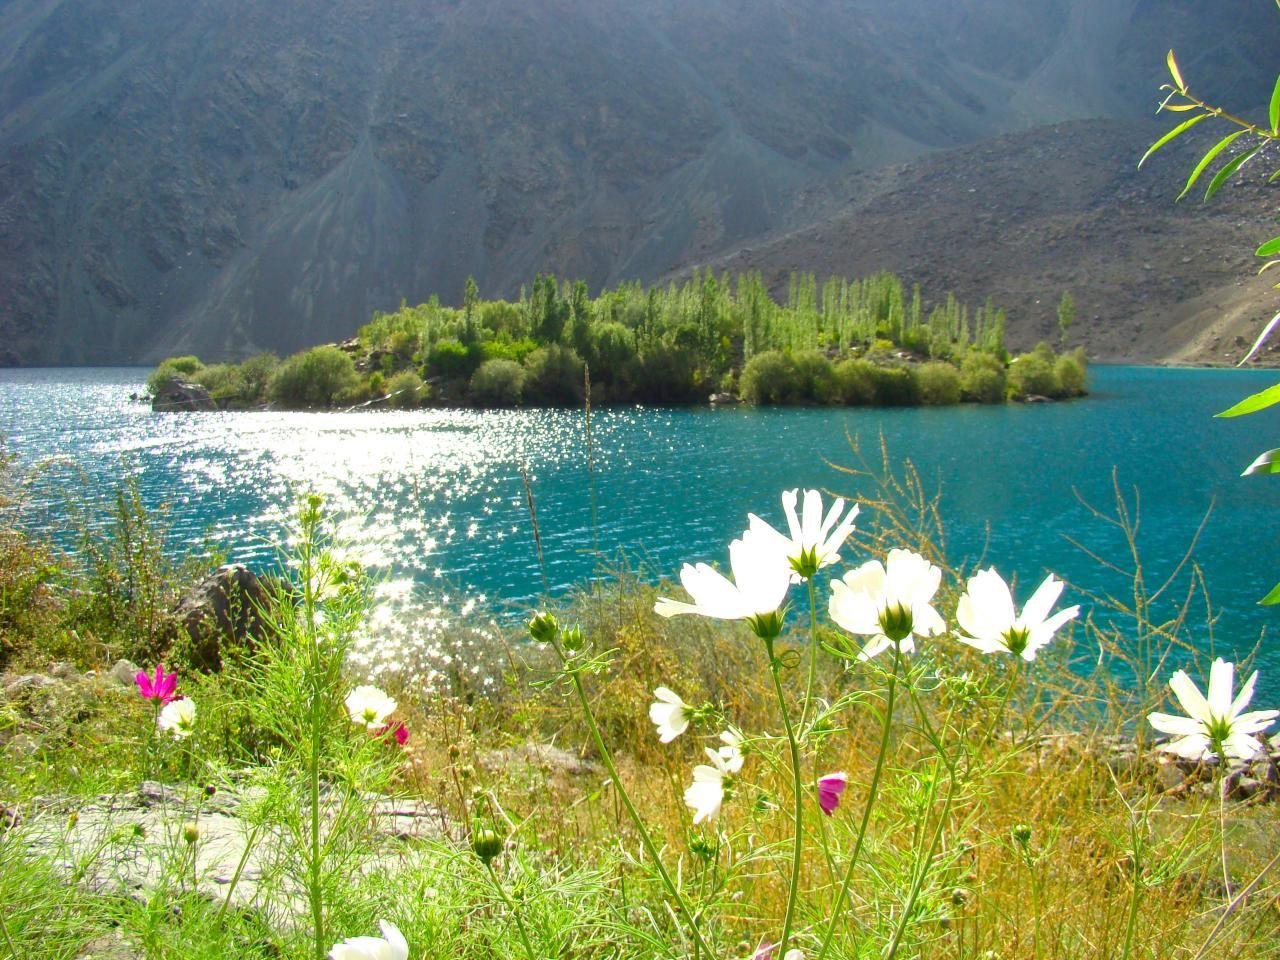 Pakistan  http://www.flickr.com/photos/faisalrafiq/3522826353/